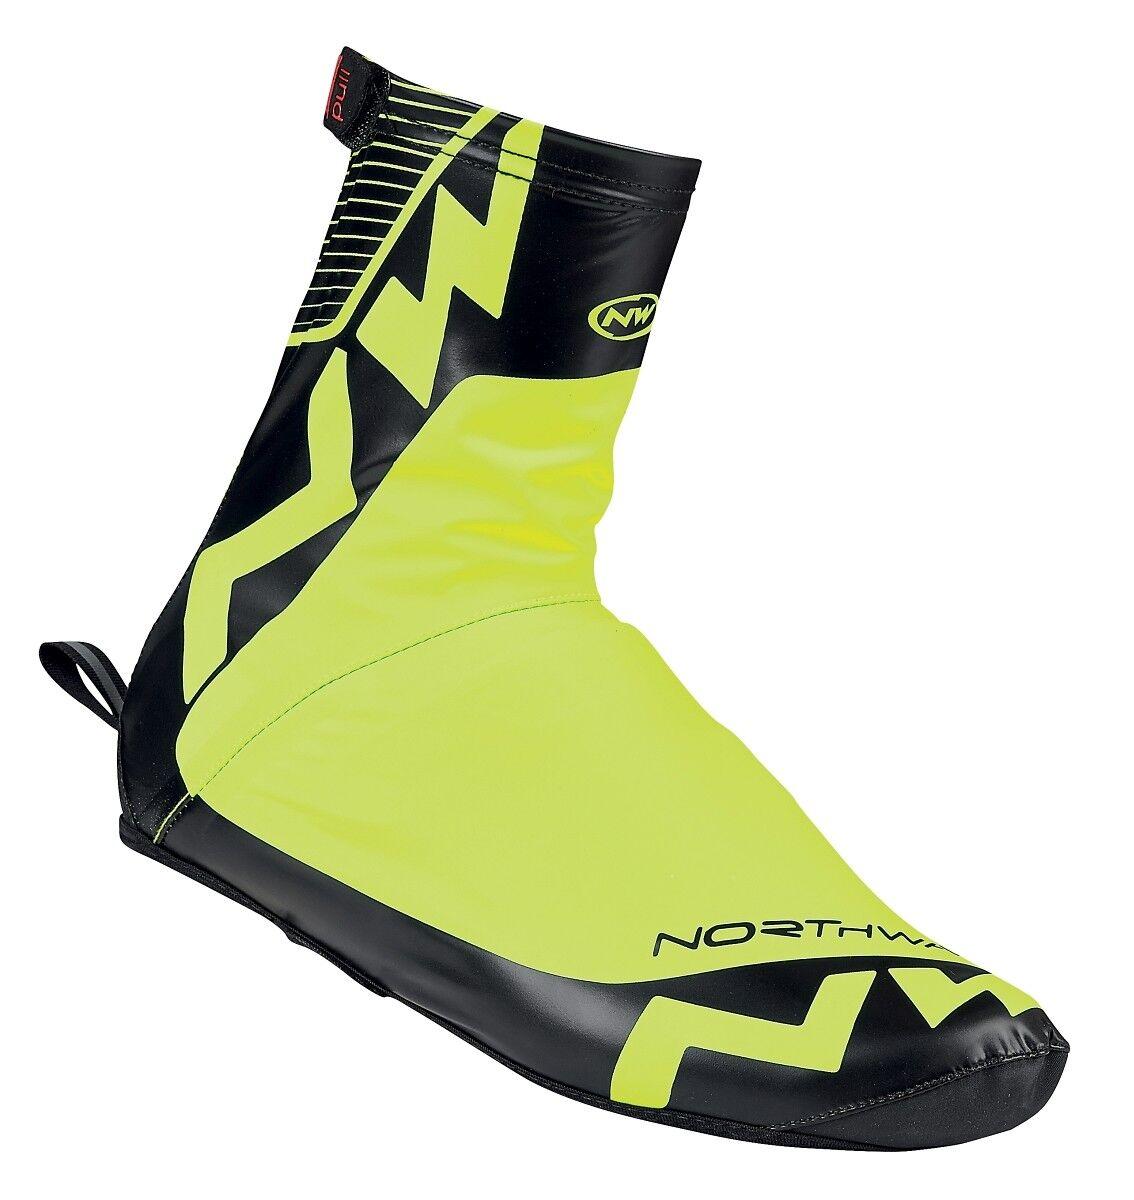 Northwave Acqua Regen Fahrrad Überschuhe yellow black 2019